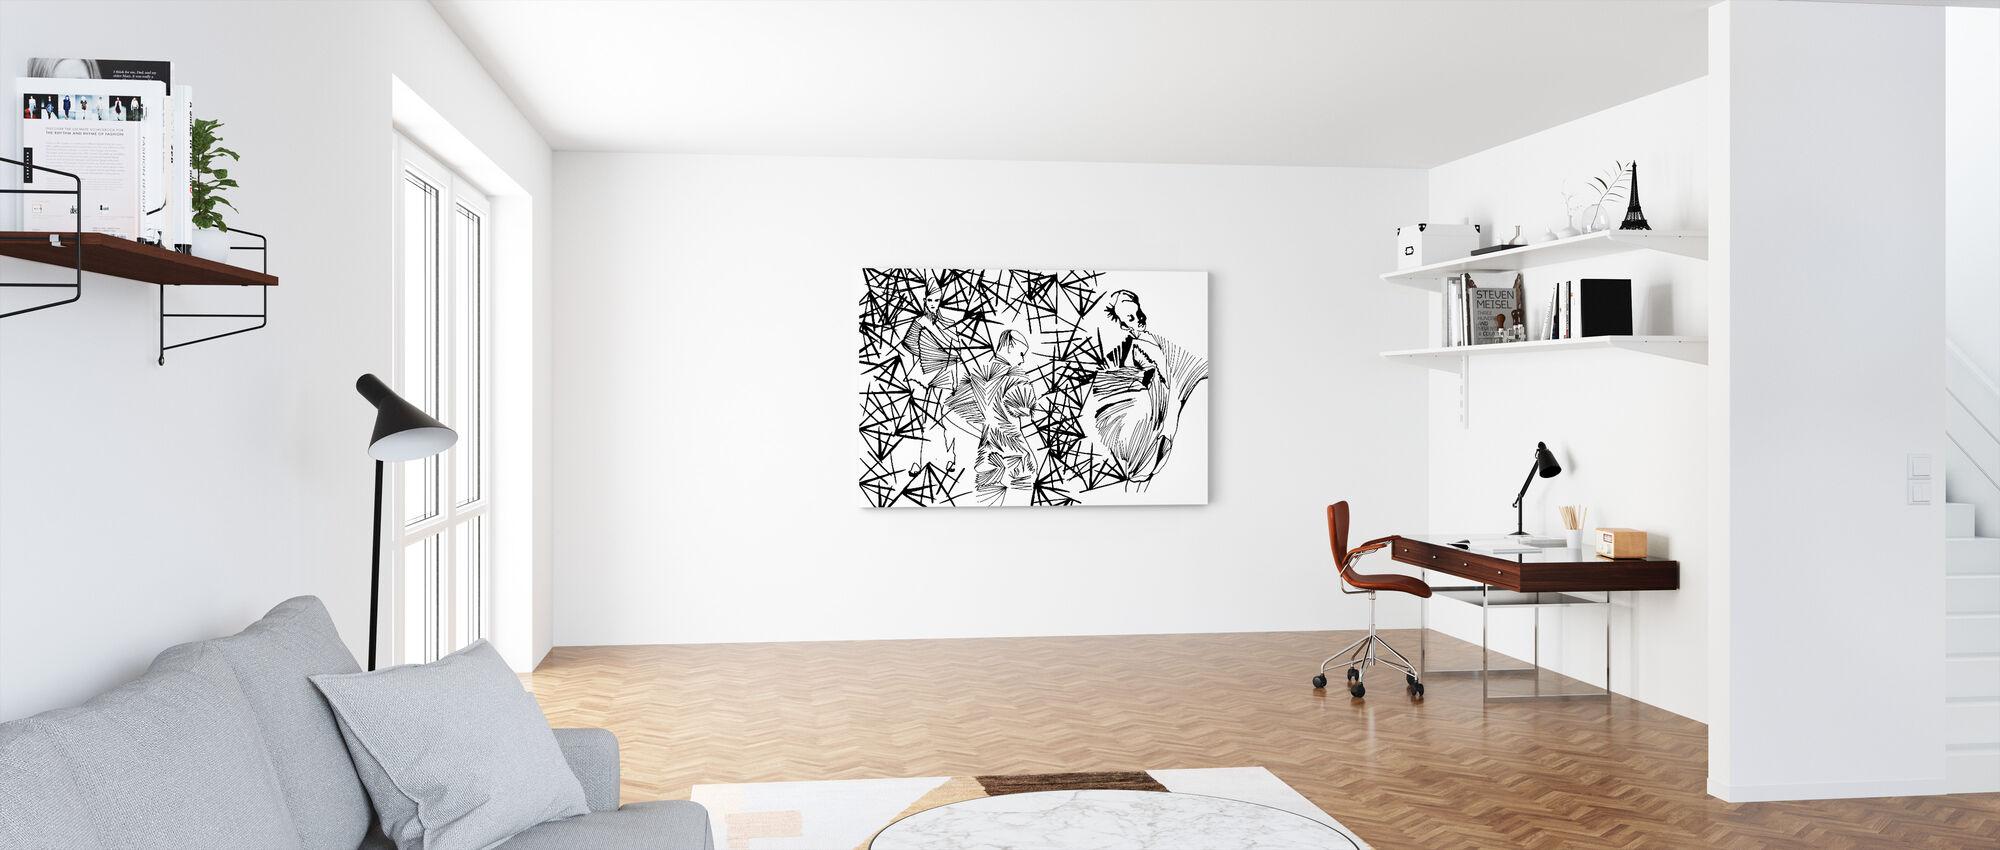 Plisserad skönhet - Canvastavla - Kontor